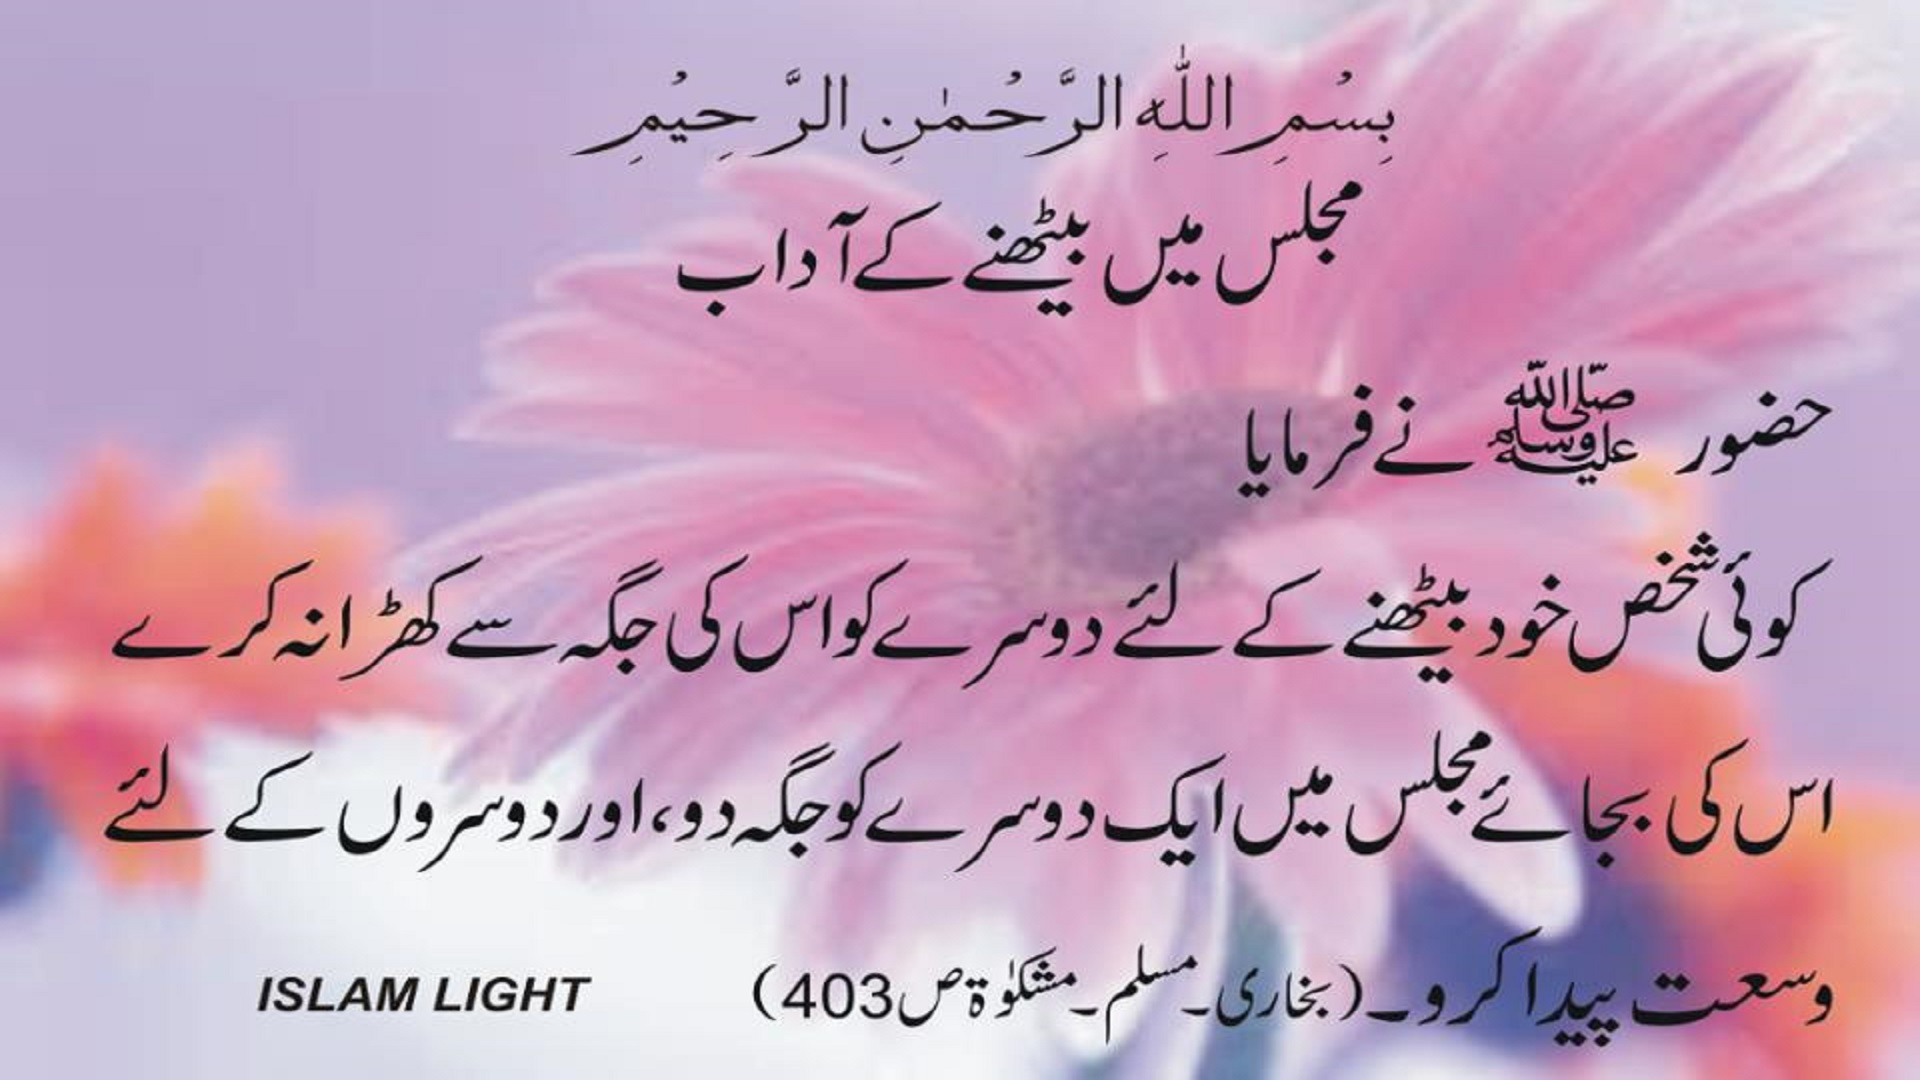 Sad Quotes Wallpapers In Urdu Majlis Mia Bethny K Adab Urdu Hadees Hd Wallpapers Free